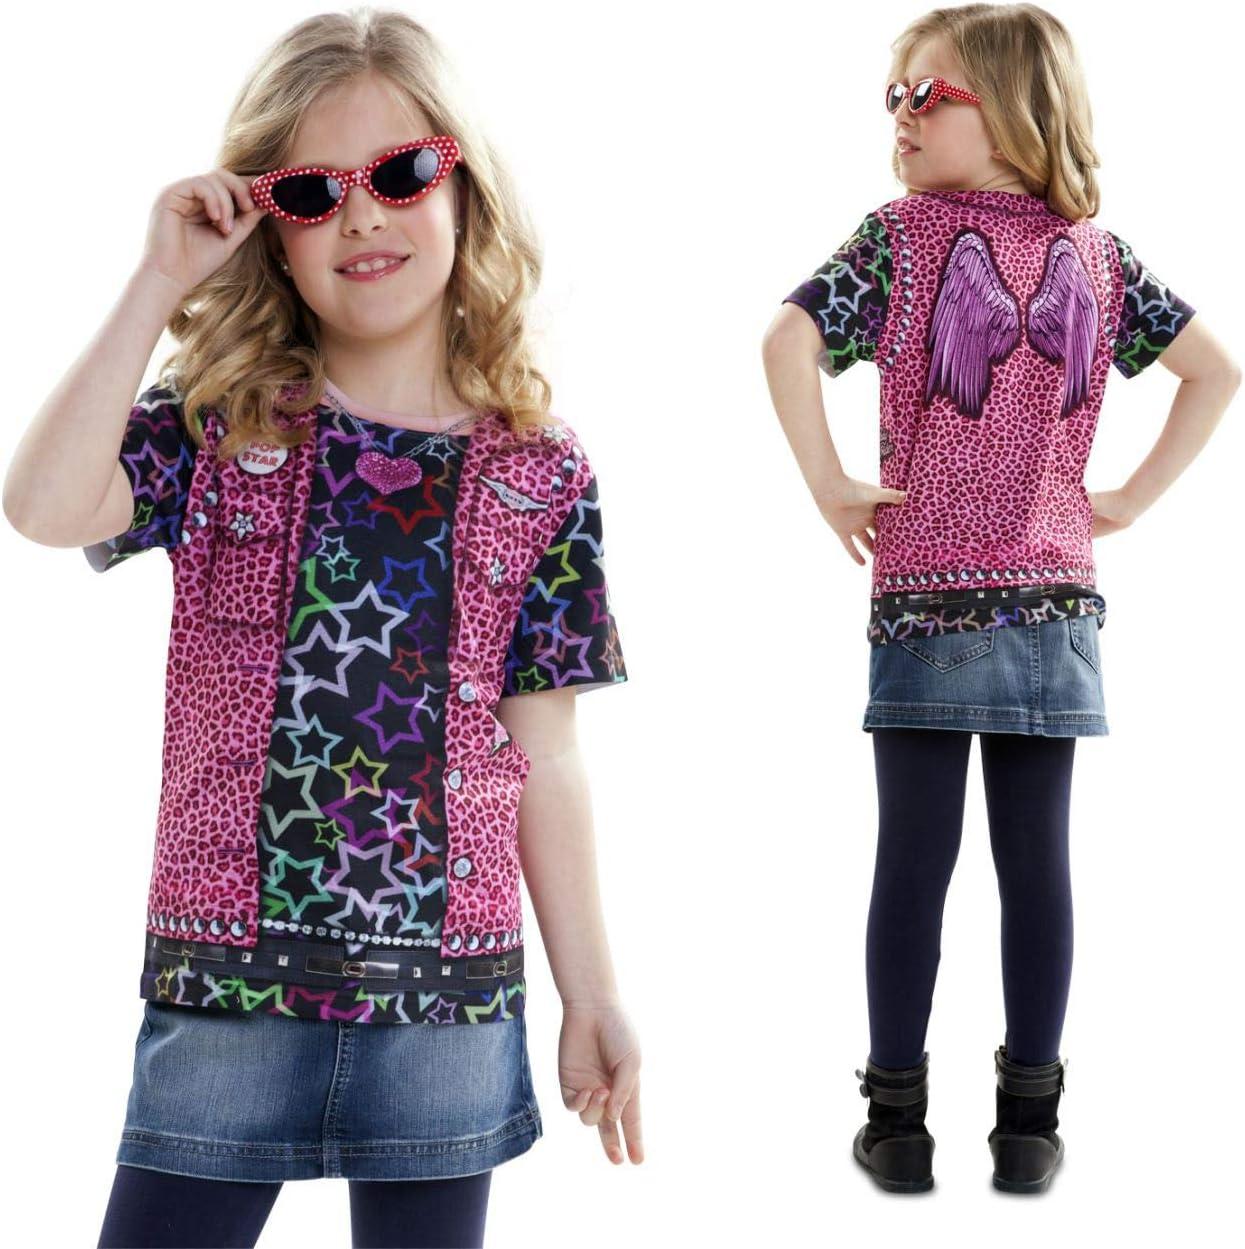 Disfraz Camiseta de Rapero Original de Carnaval para niña de 8-10 ...